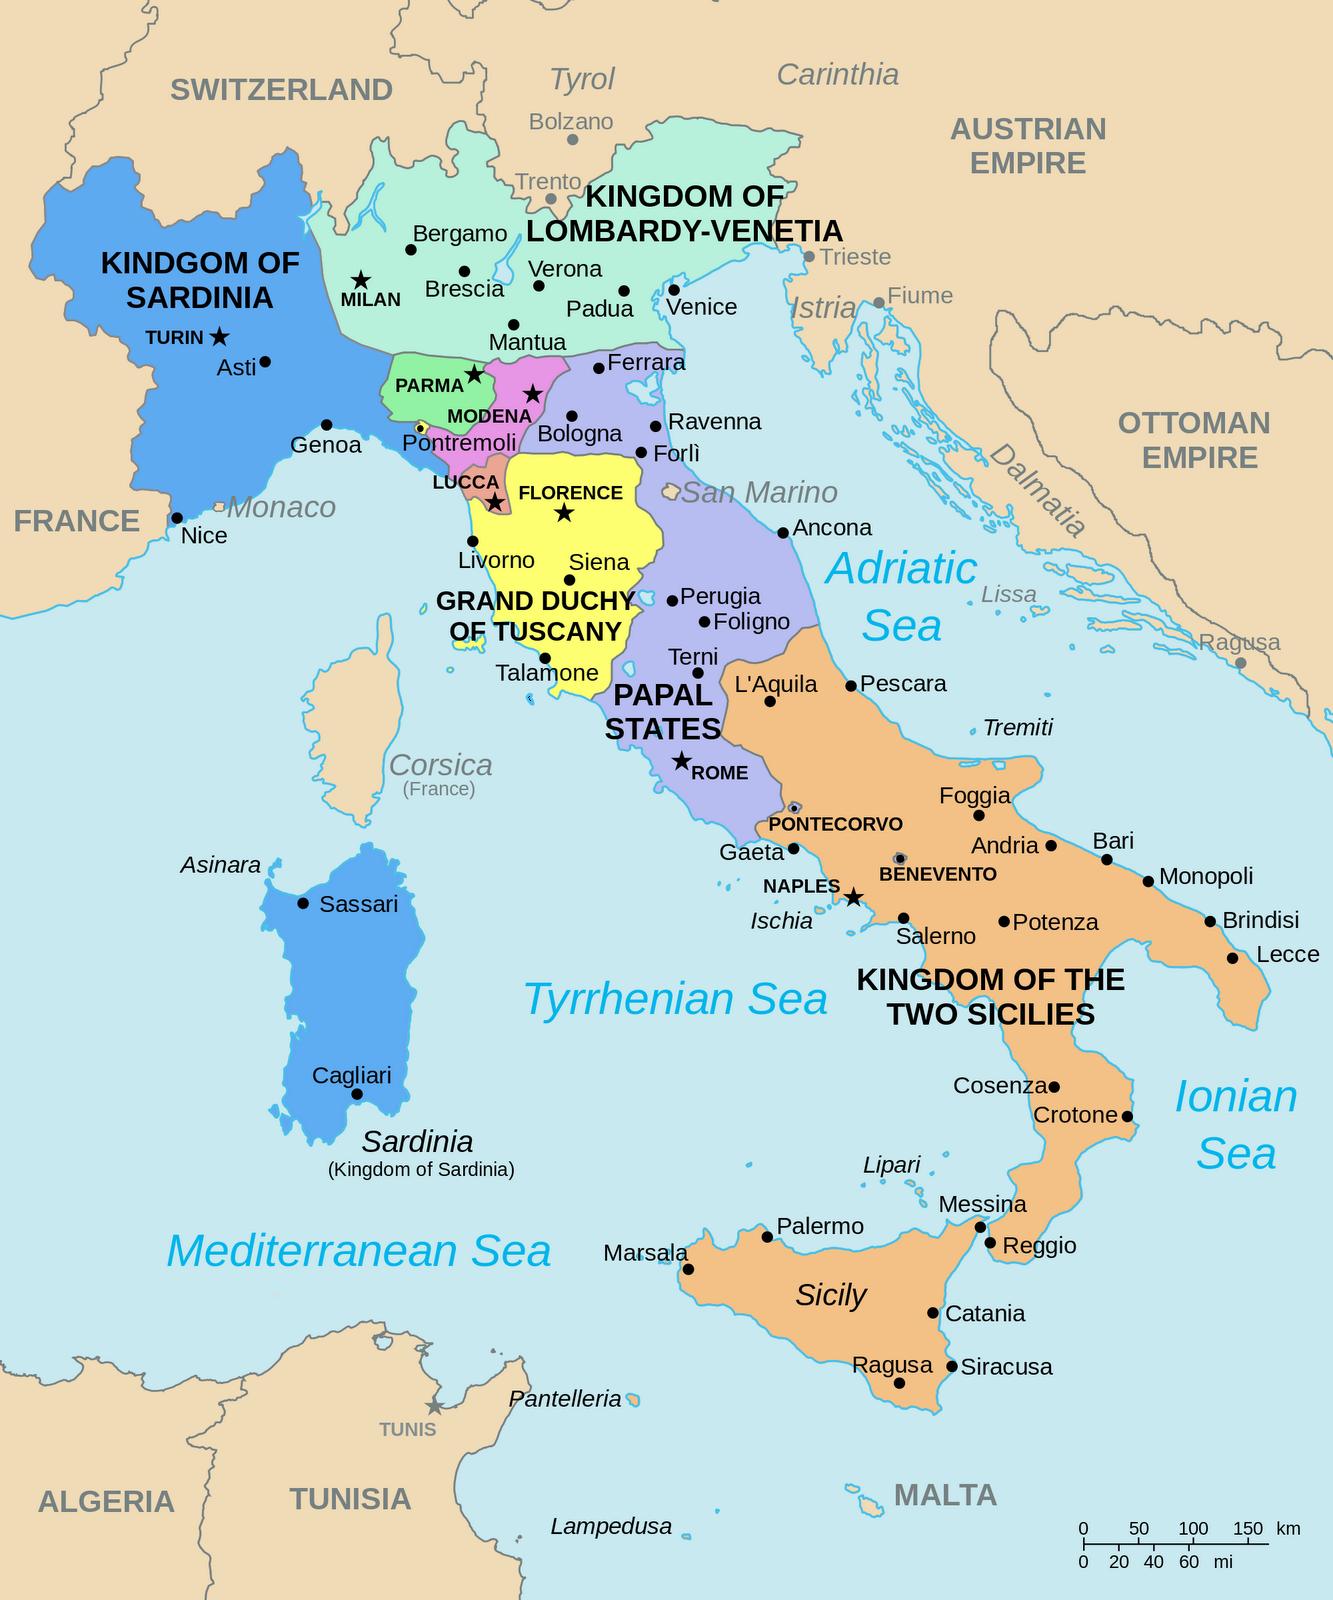 Big Blue 18401940 Italian States a classical minefield